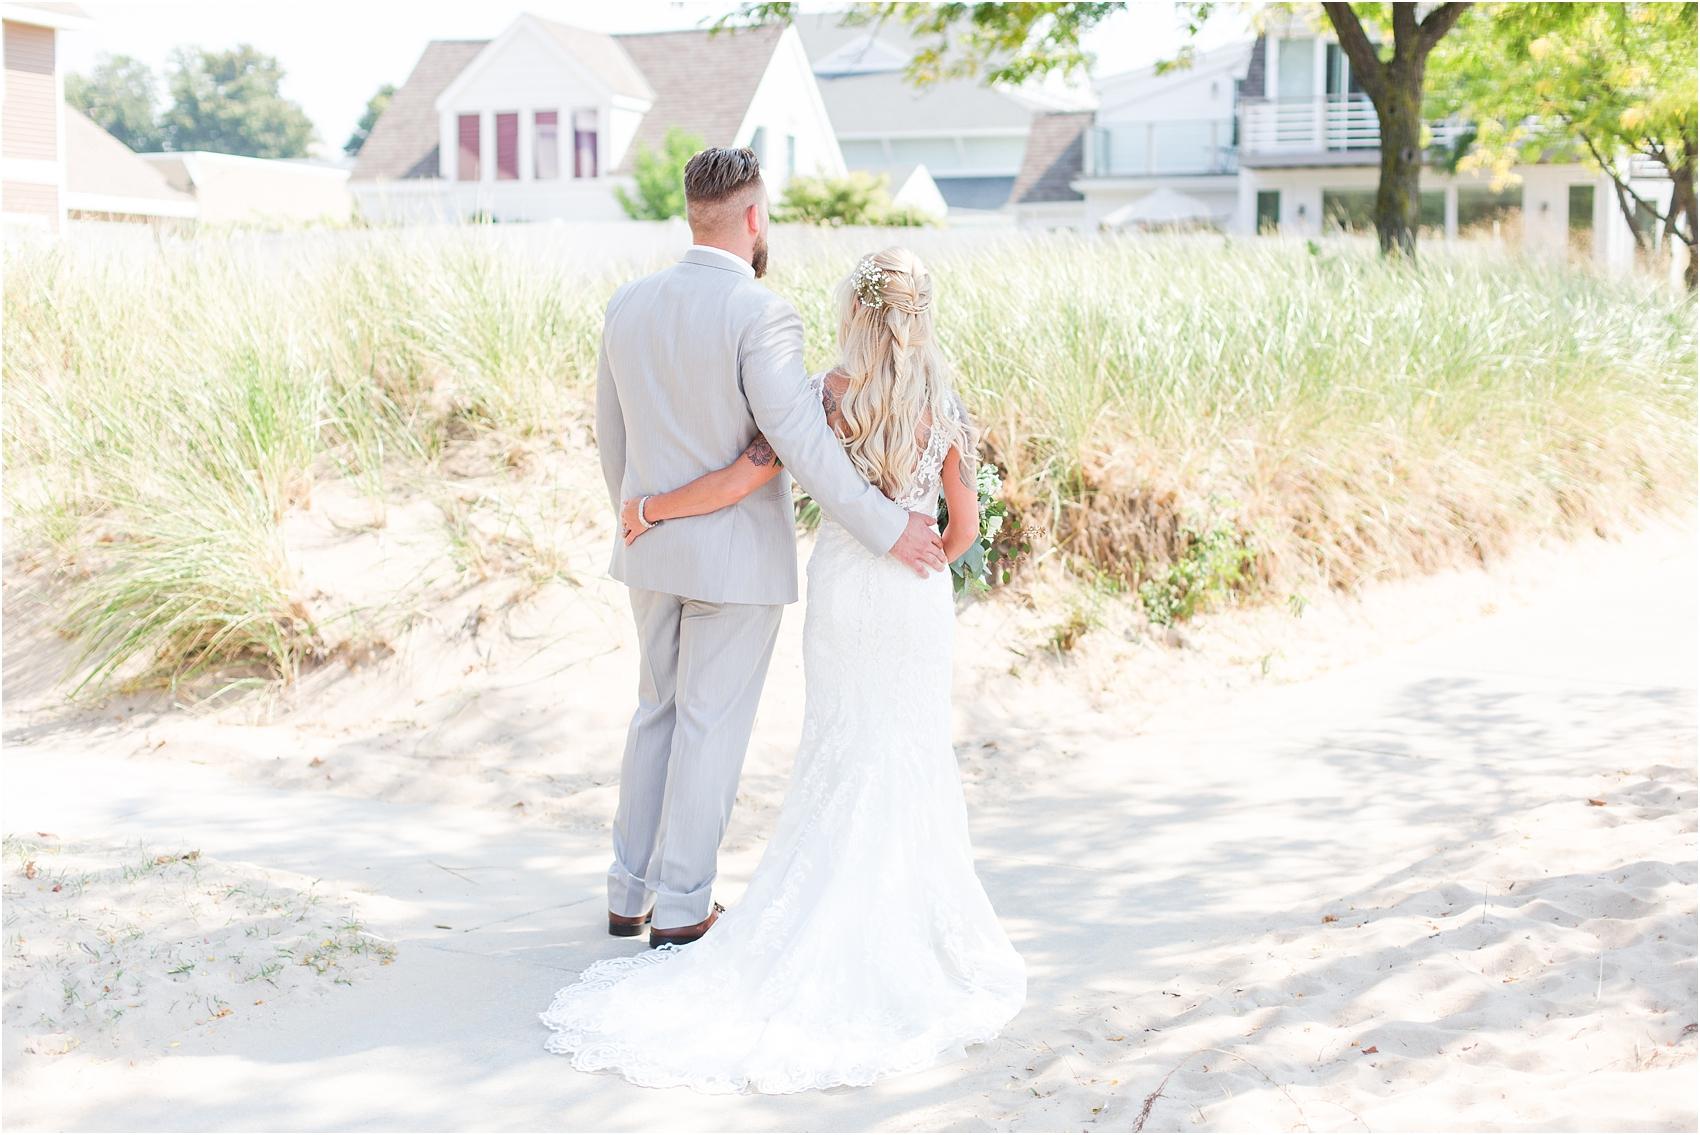 fun-whimsical-beach-wedding-photos-in-st-joseph-michigan-by-courtney-carolyn-photography_0042.jpg